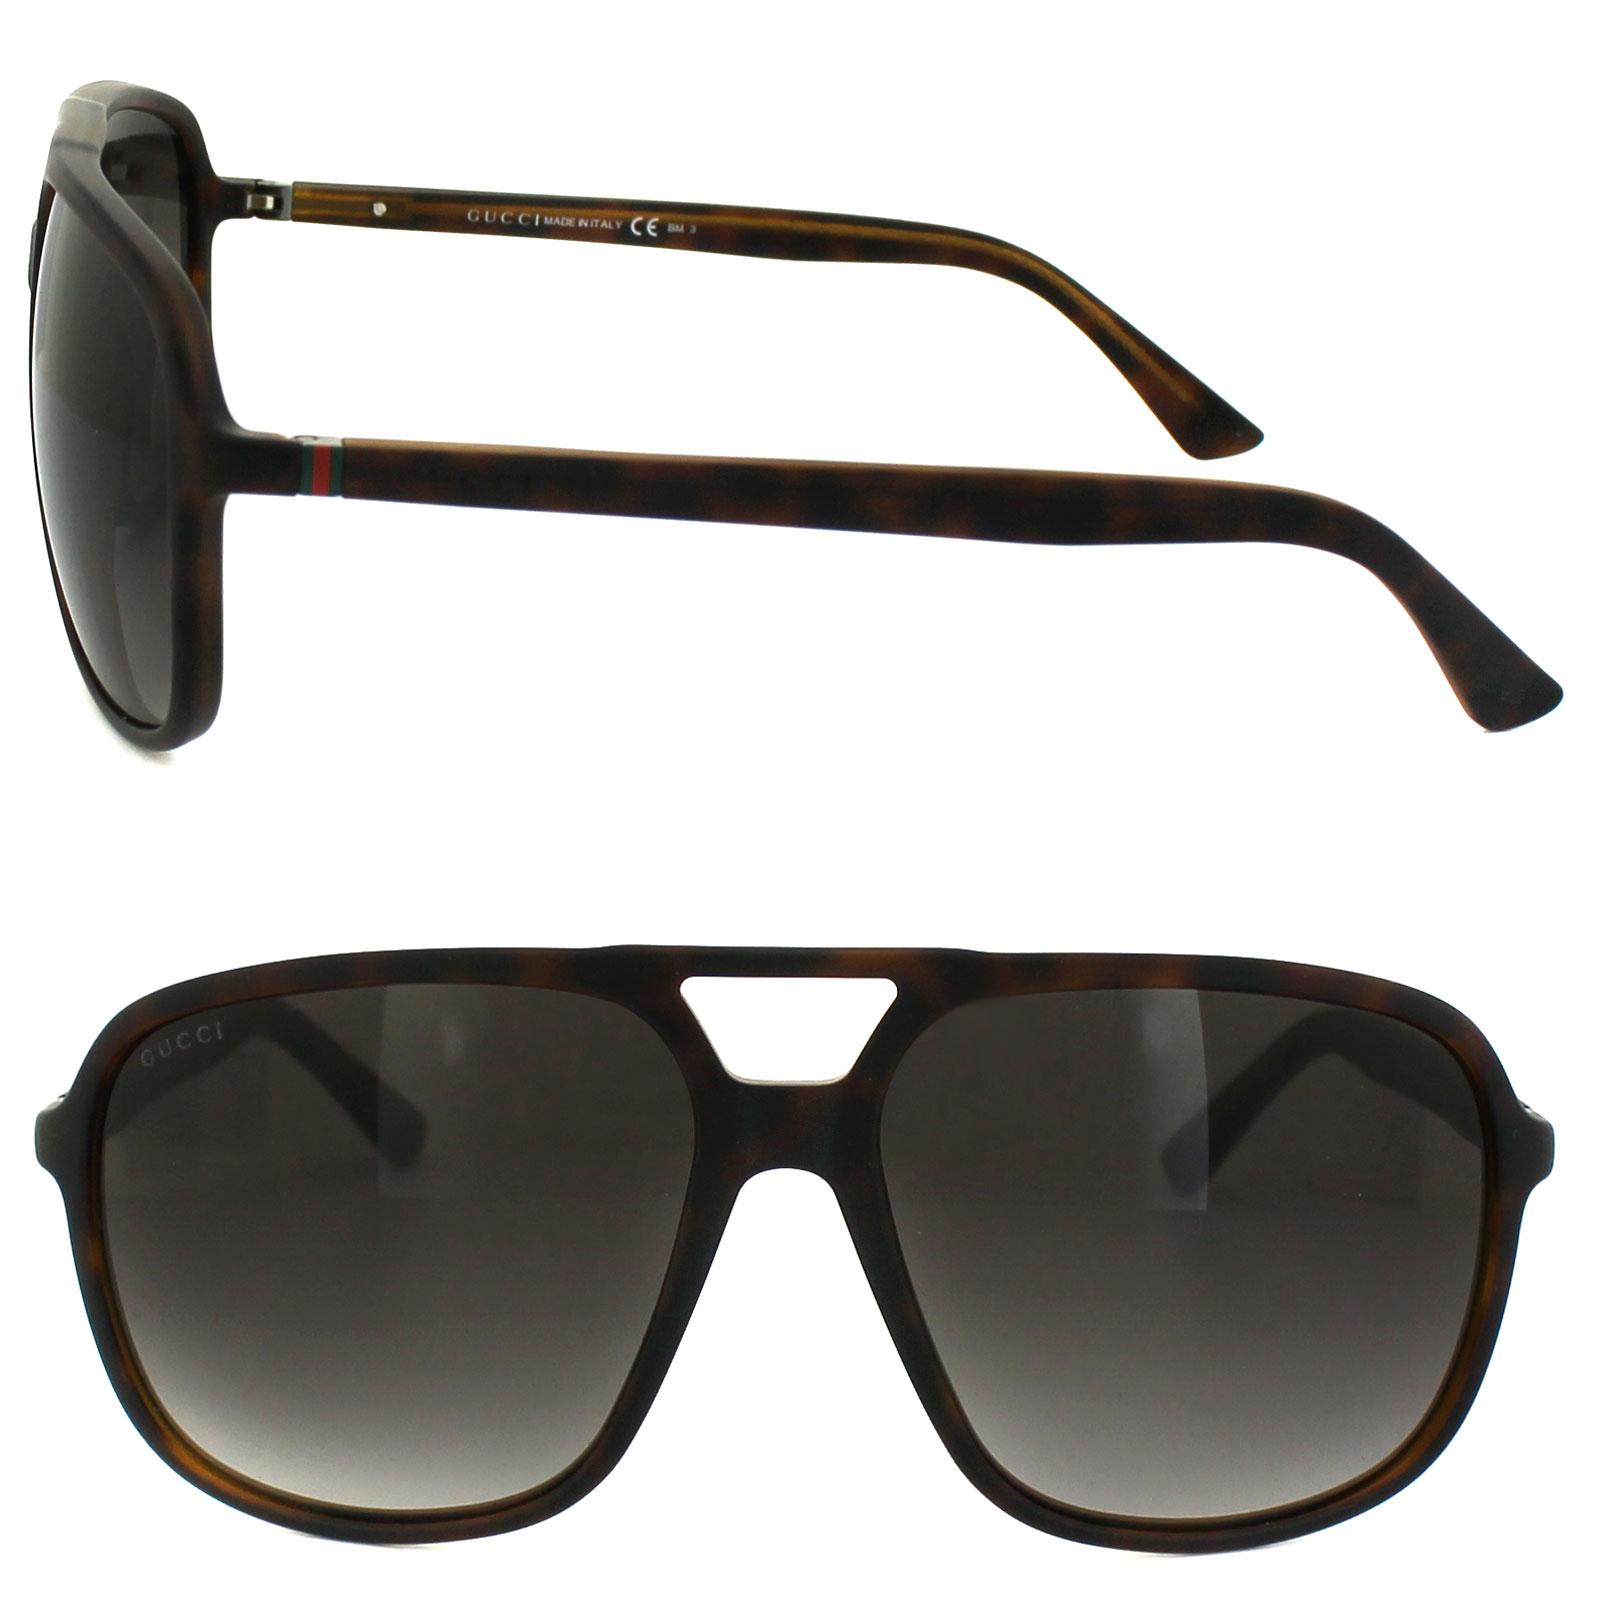 0de77b3b191 Gucci 1091 Sunglasses Thumbnail 1 Gucci 1091 Sunglasses Thumbnail 2 ...